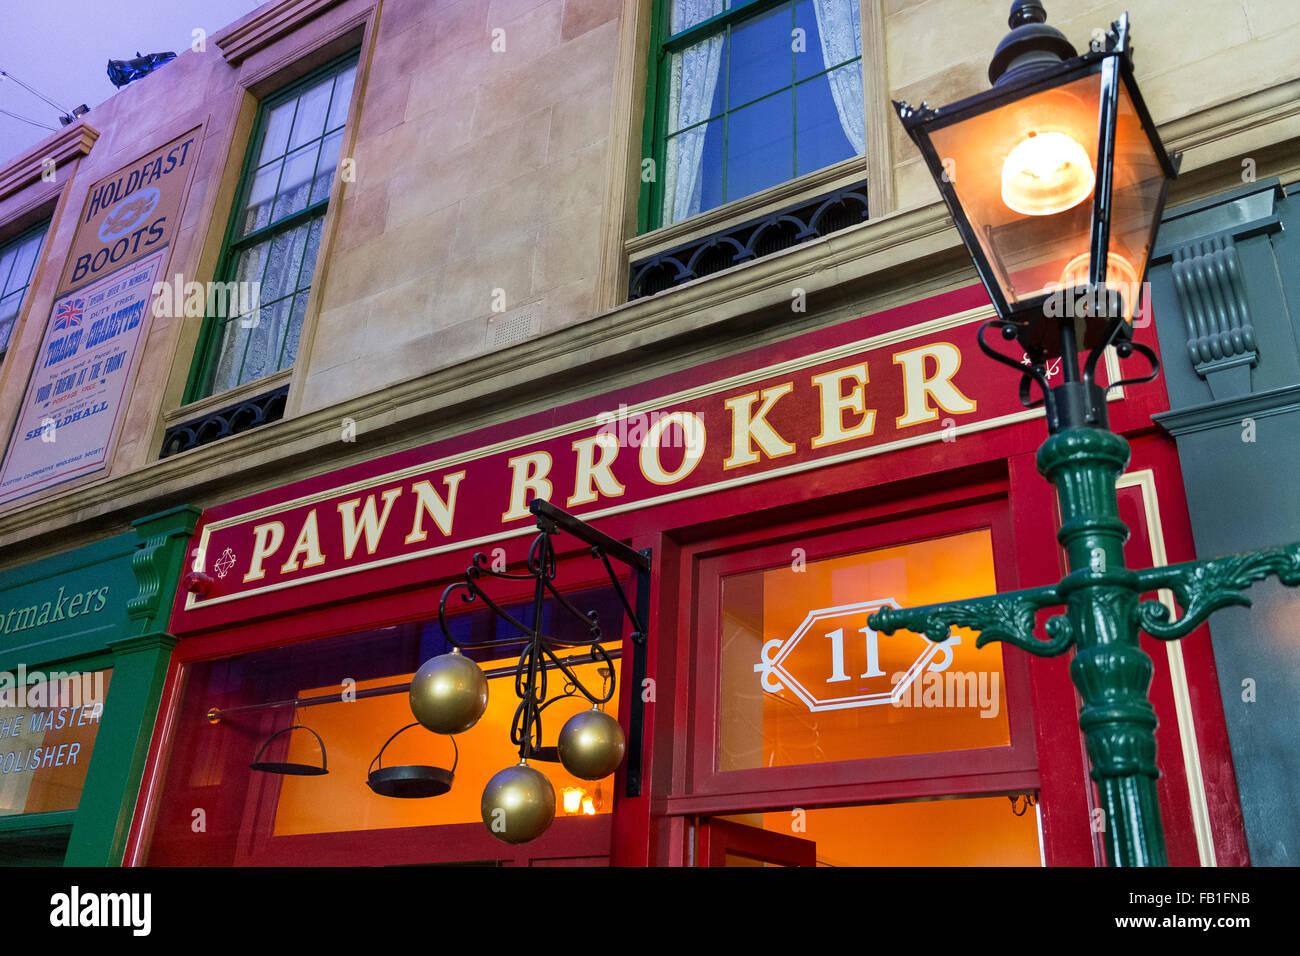 pawn broker - Stock Image